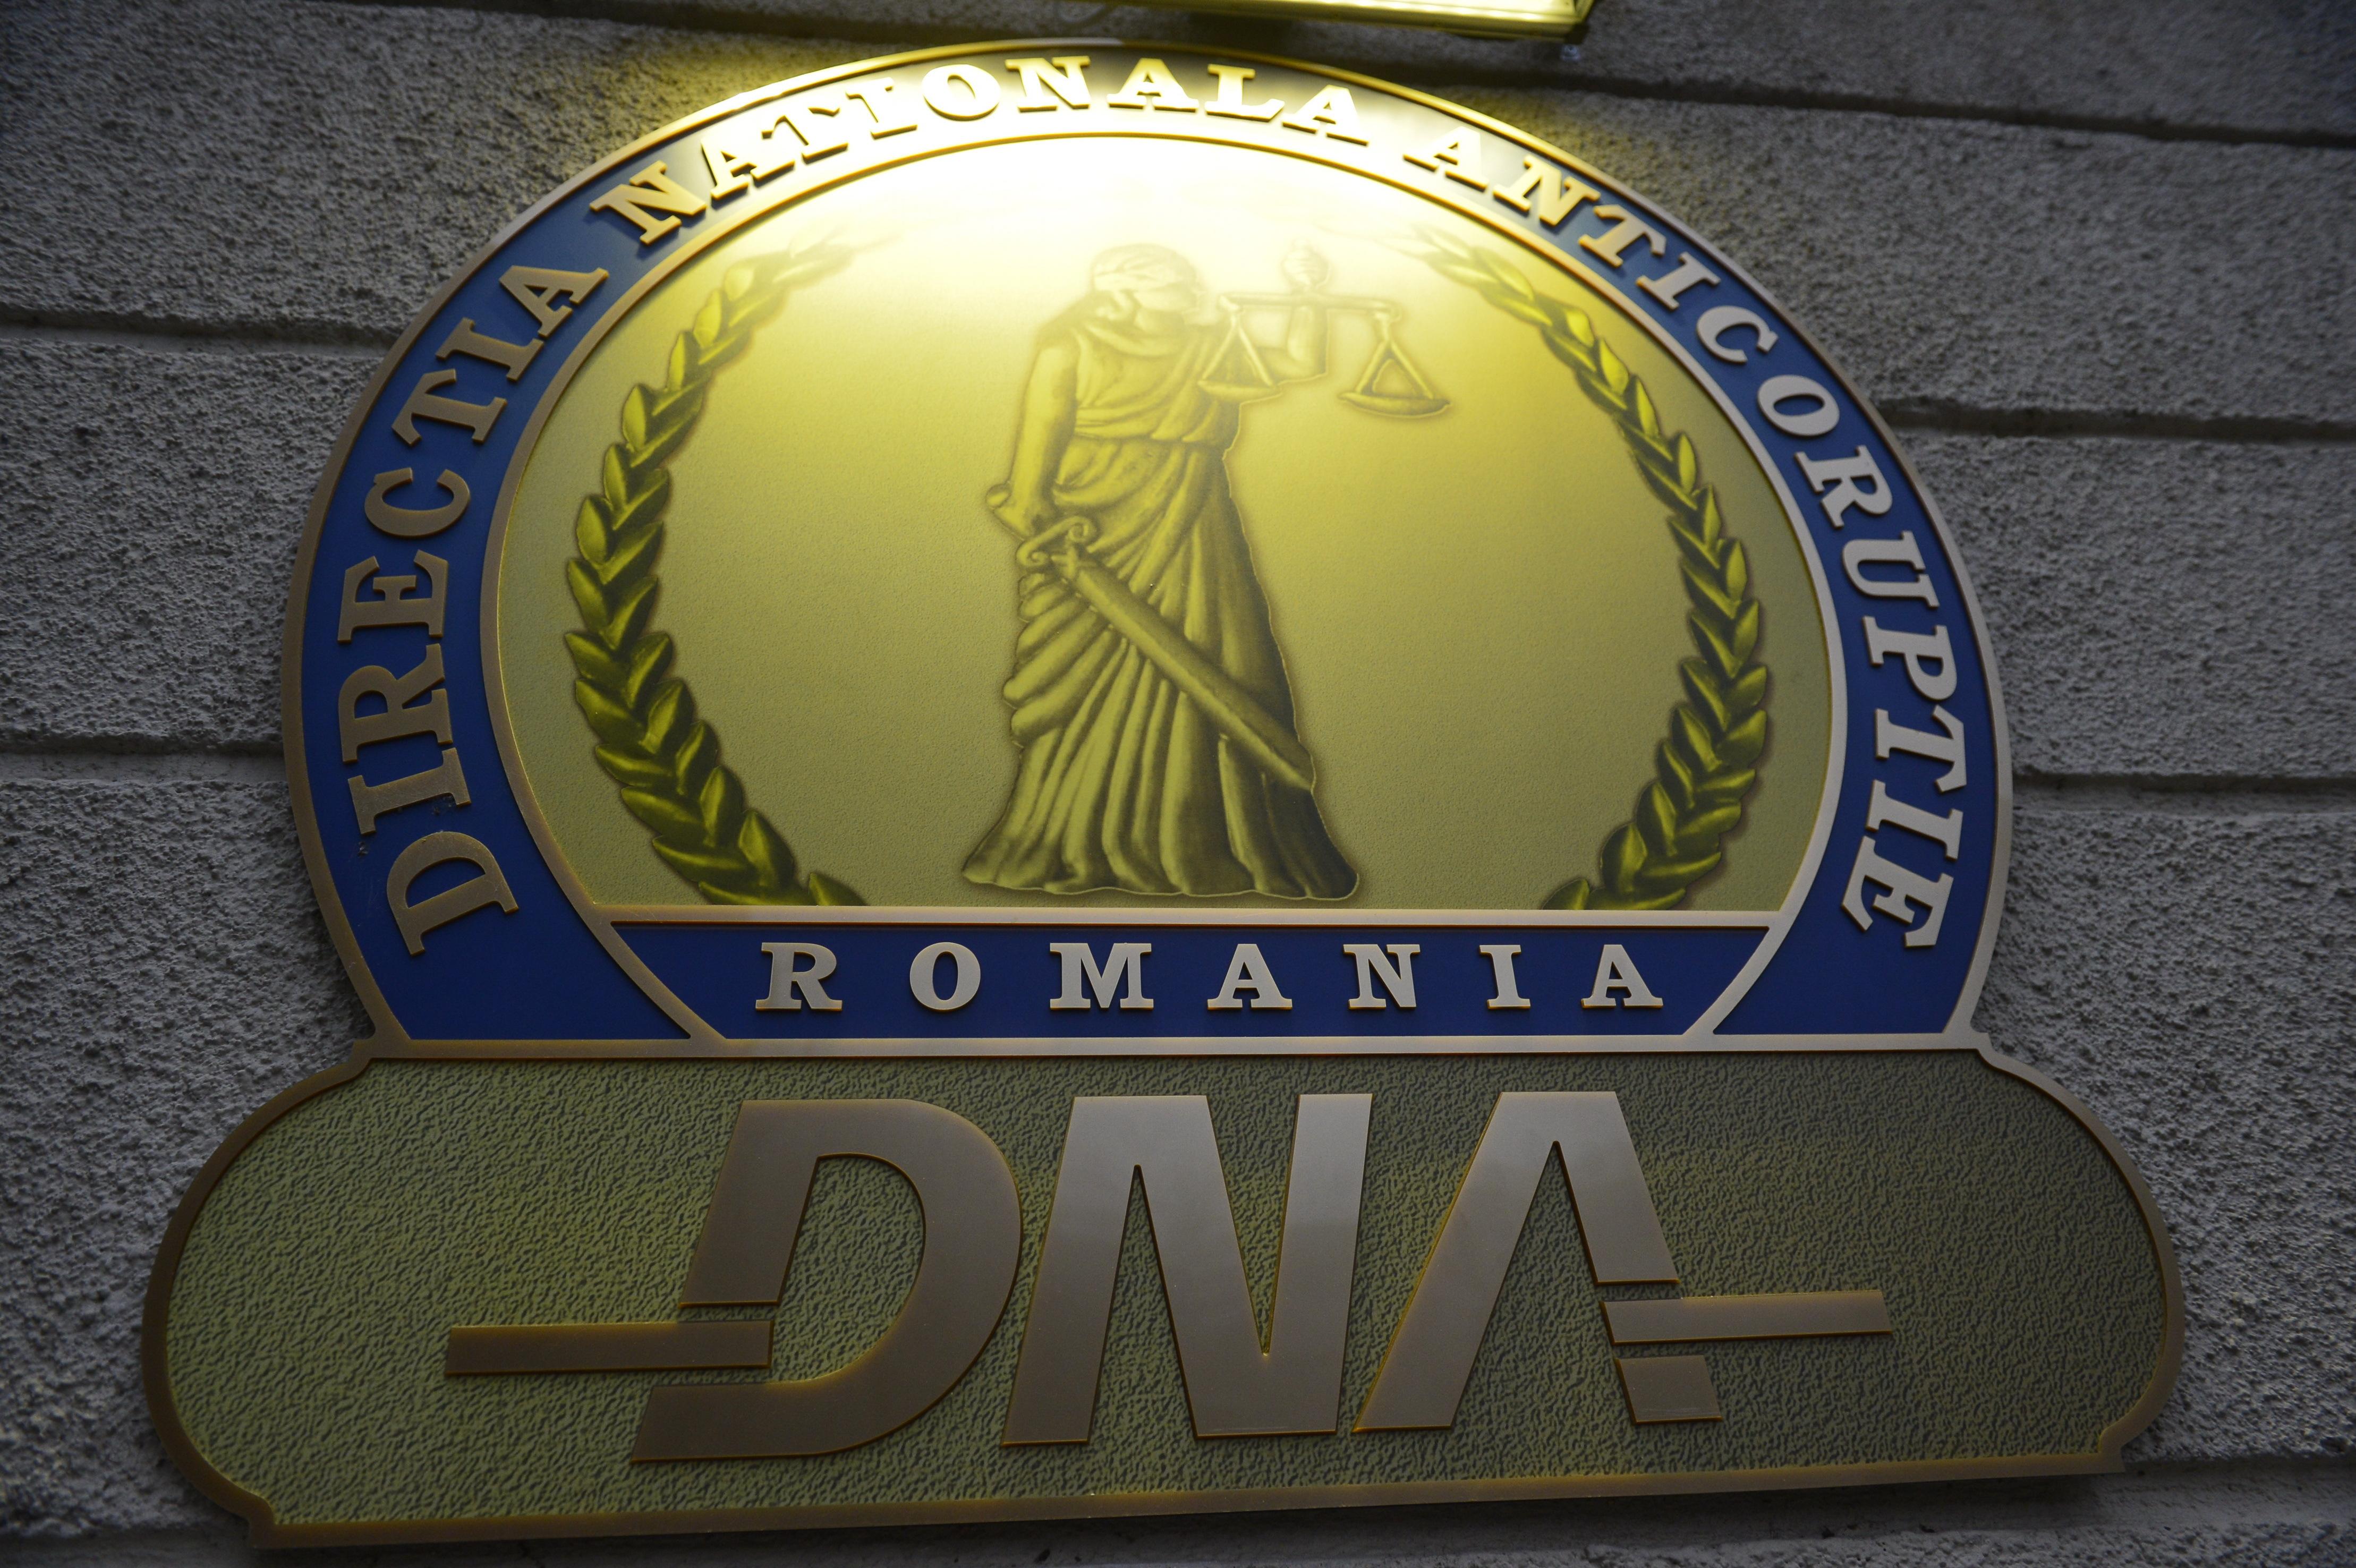 Dosar de evaziune fiscală, restituit la DNA